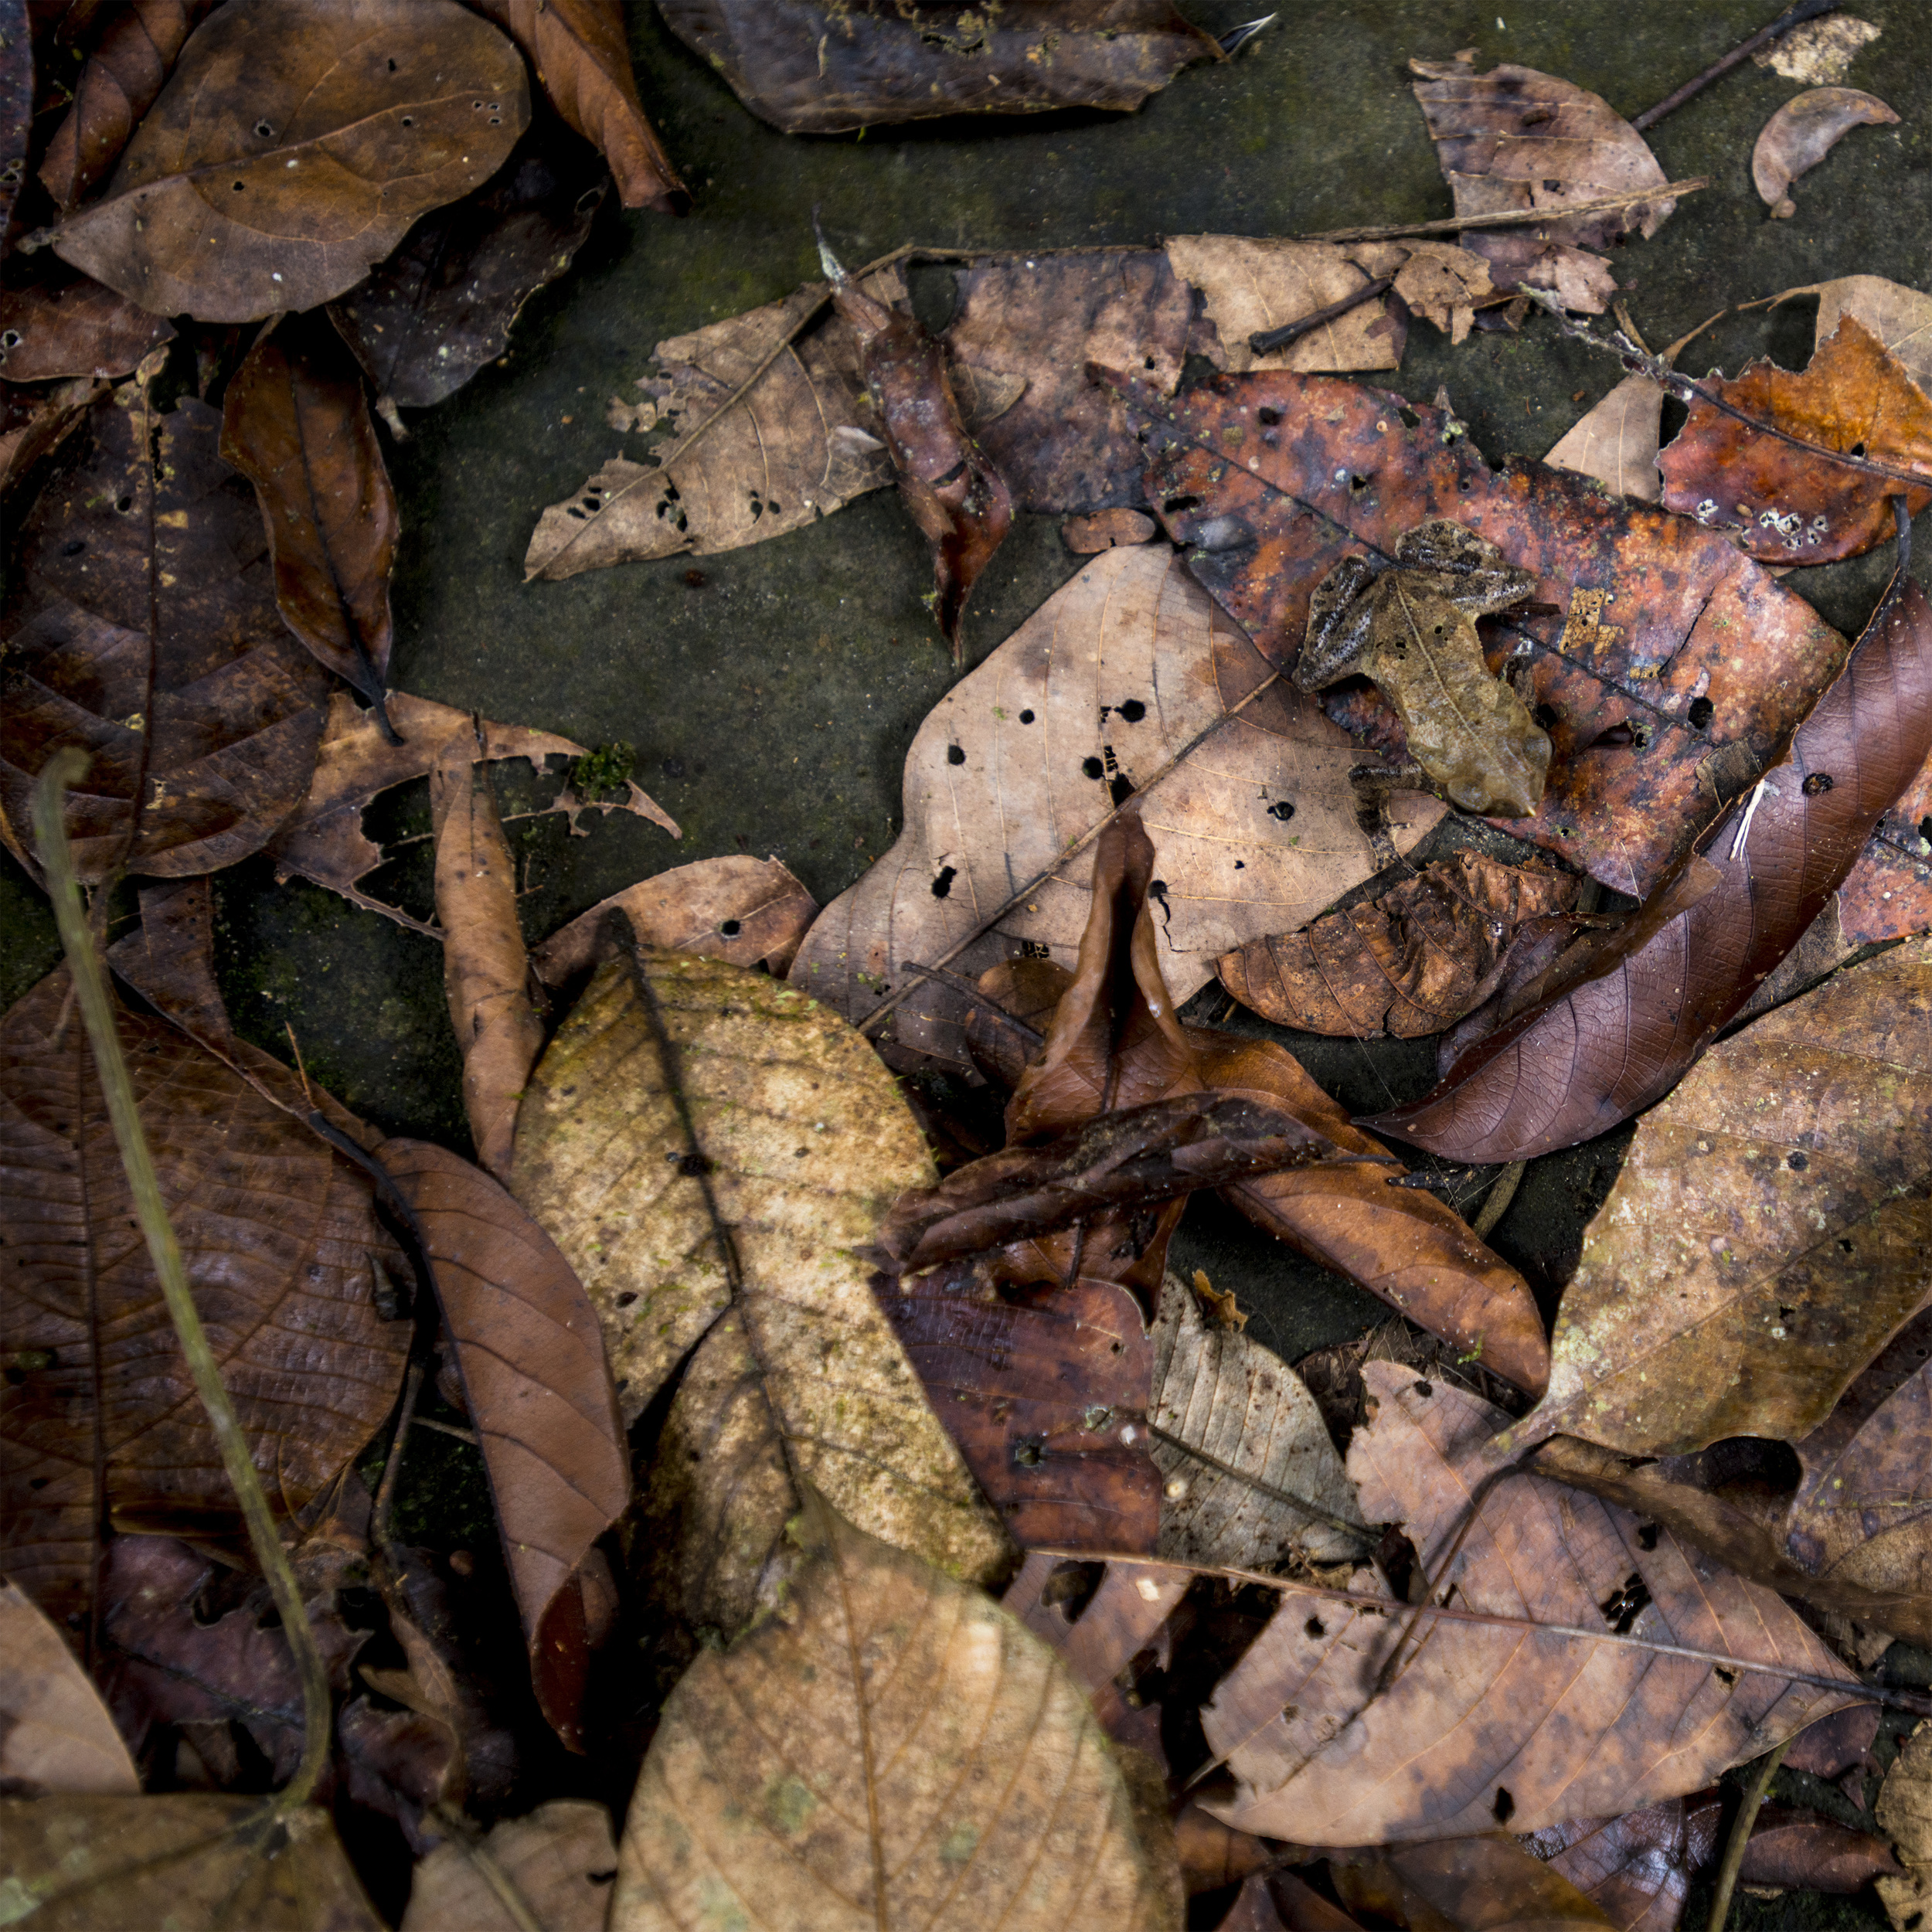 Leaf Mimicking Toad